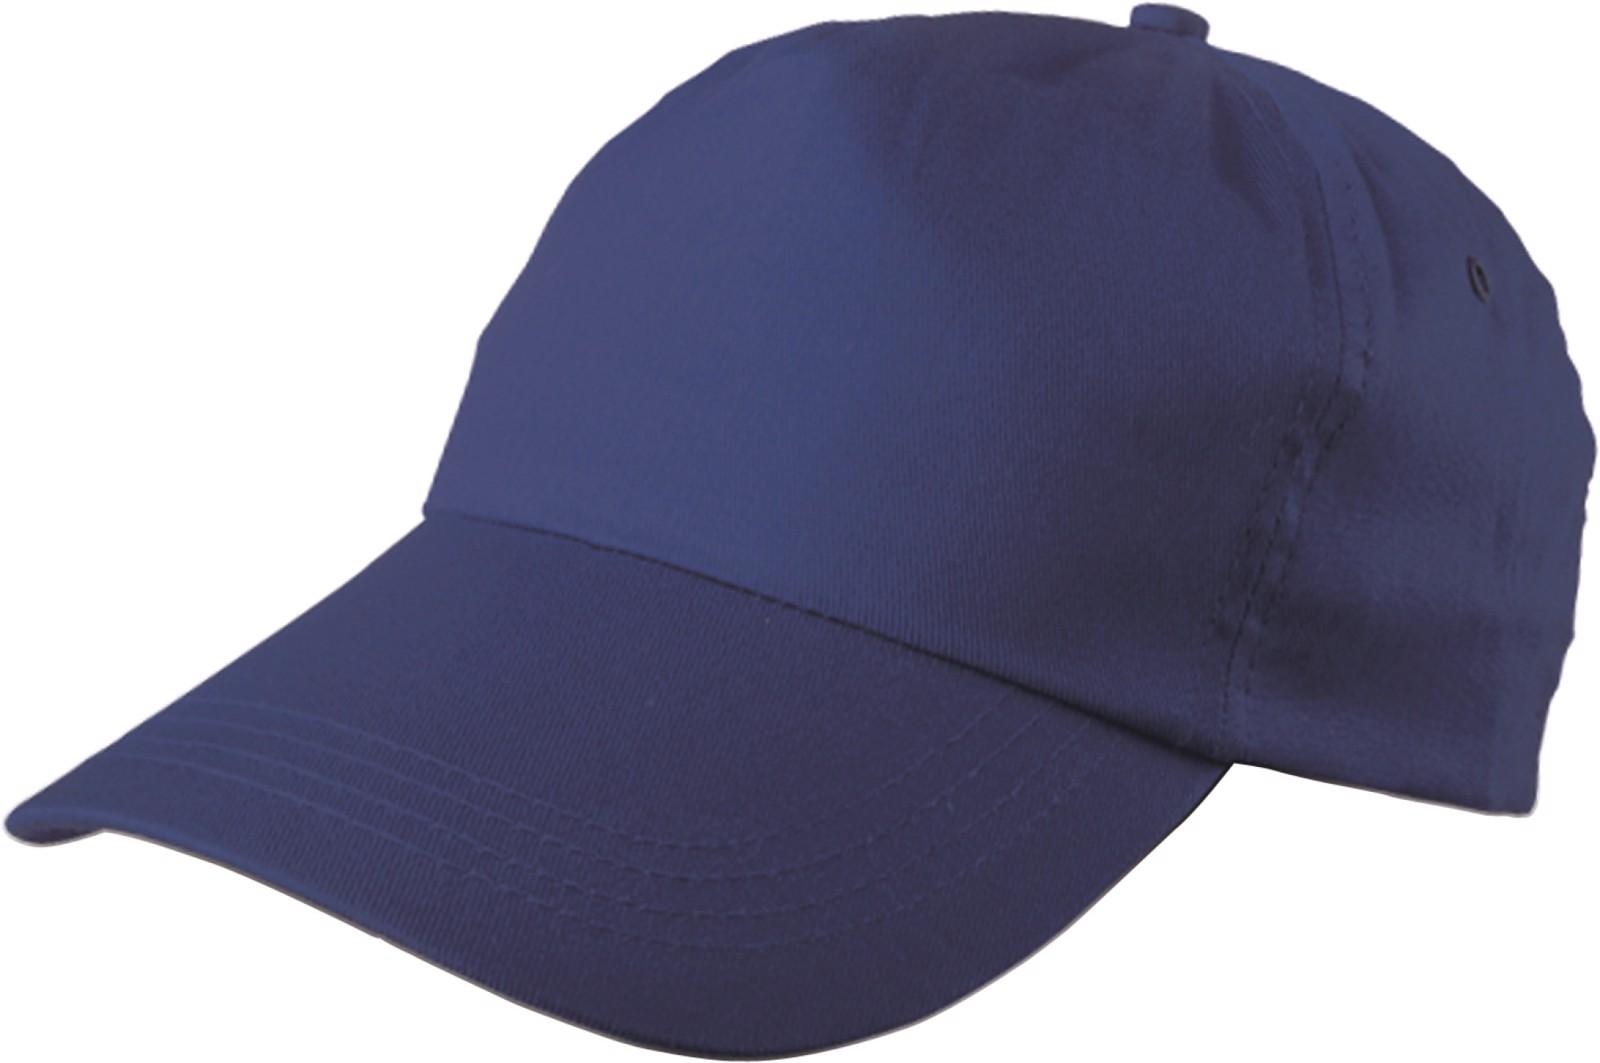 Cotton twill cap - Cobalt Blue